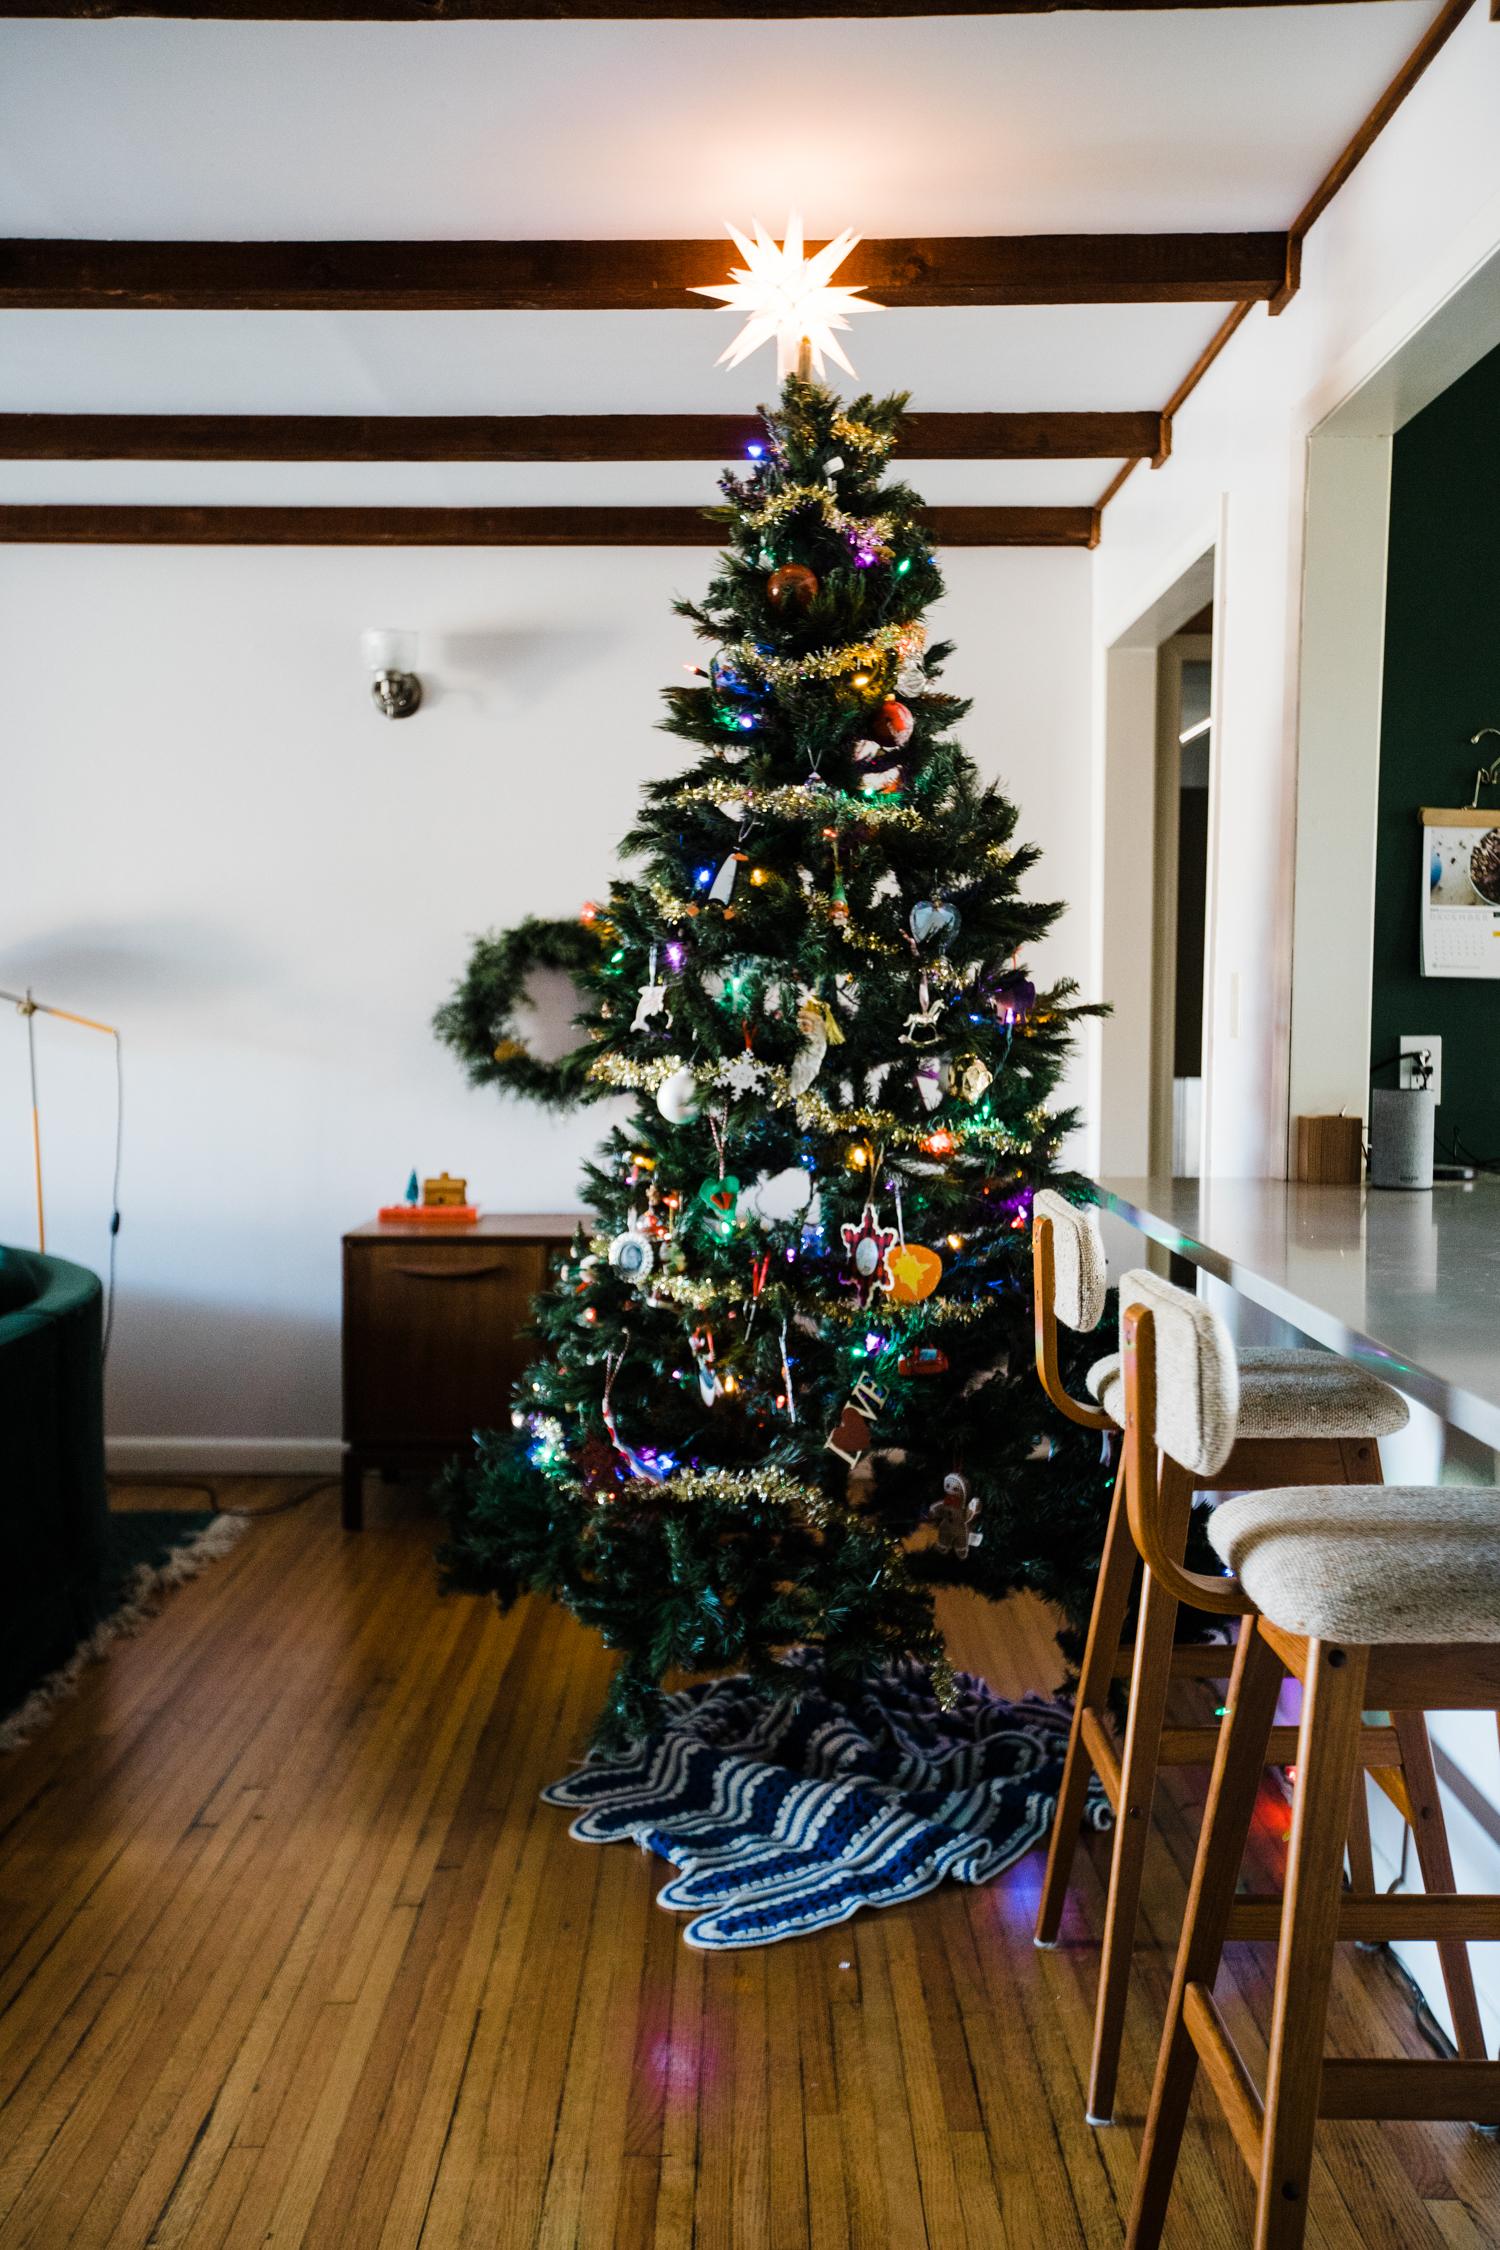 palmer_holiday_2018-34.jpg